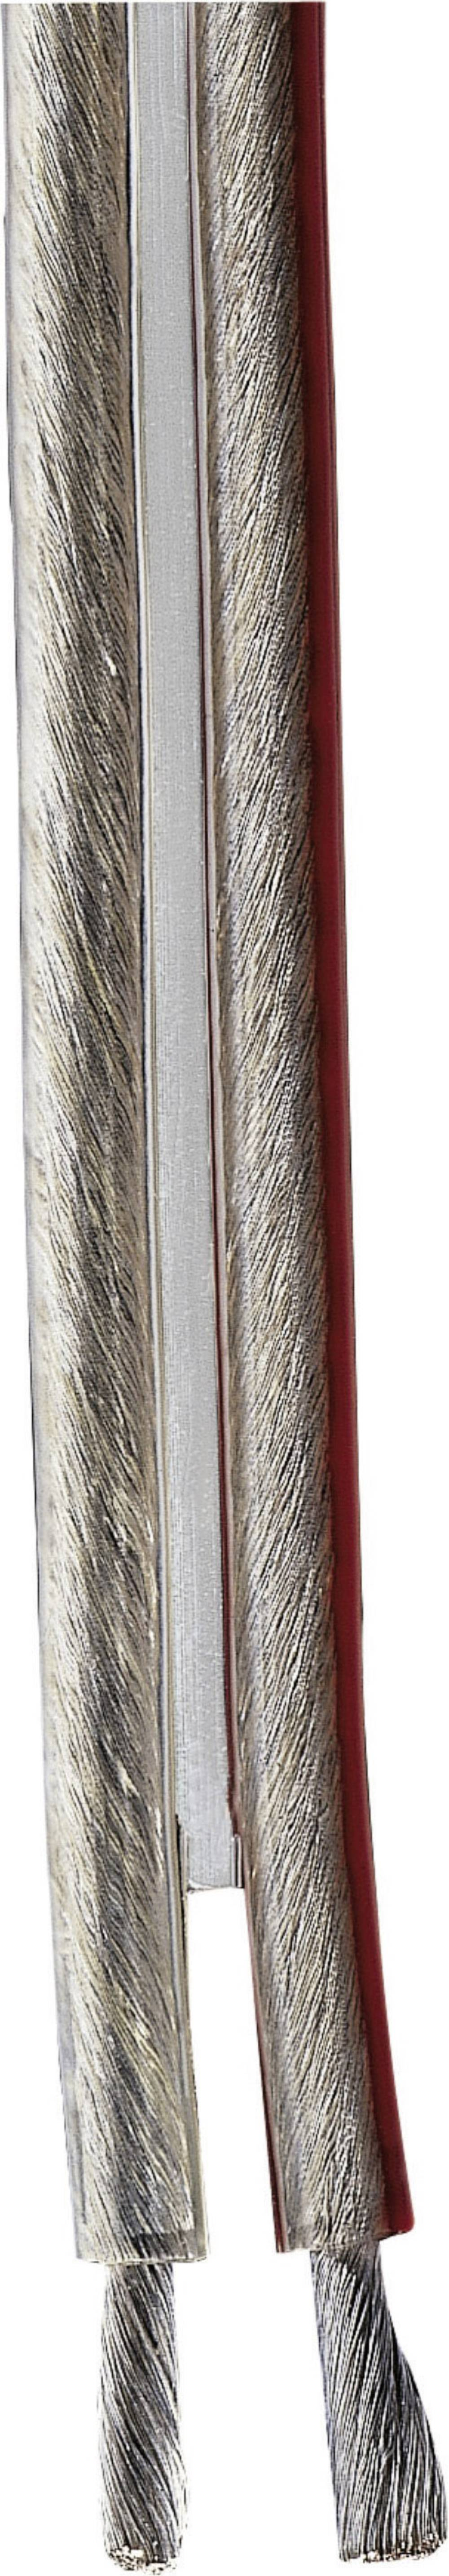 Kabel za zvučnike 86619 Hama 2 x 4 mm prozirna, roba na metre